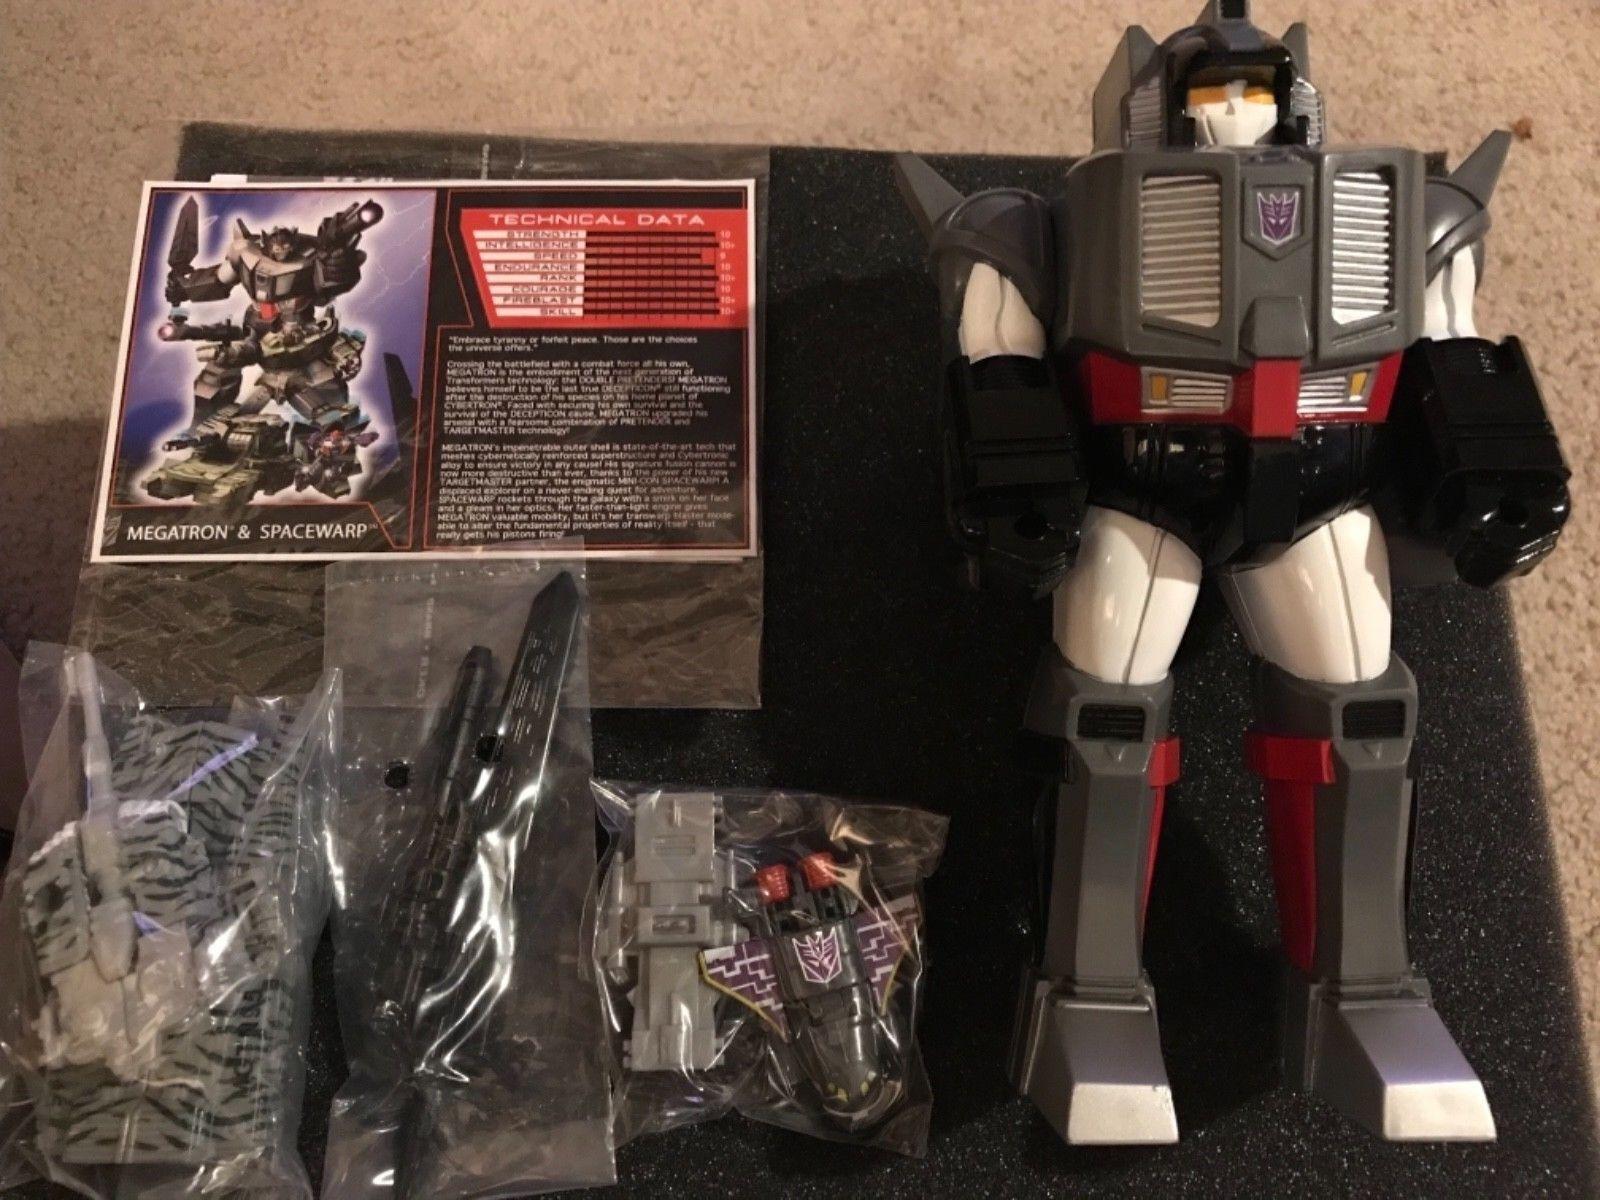 Transformers Funpub TFCC TFSS Subscription 5.0 Pretender Megatron spacewarp New